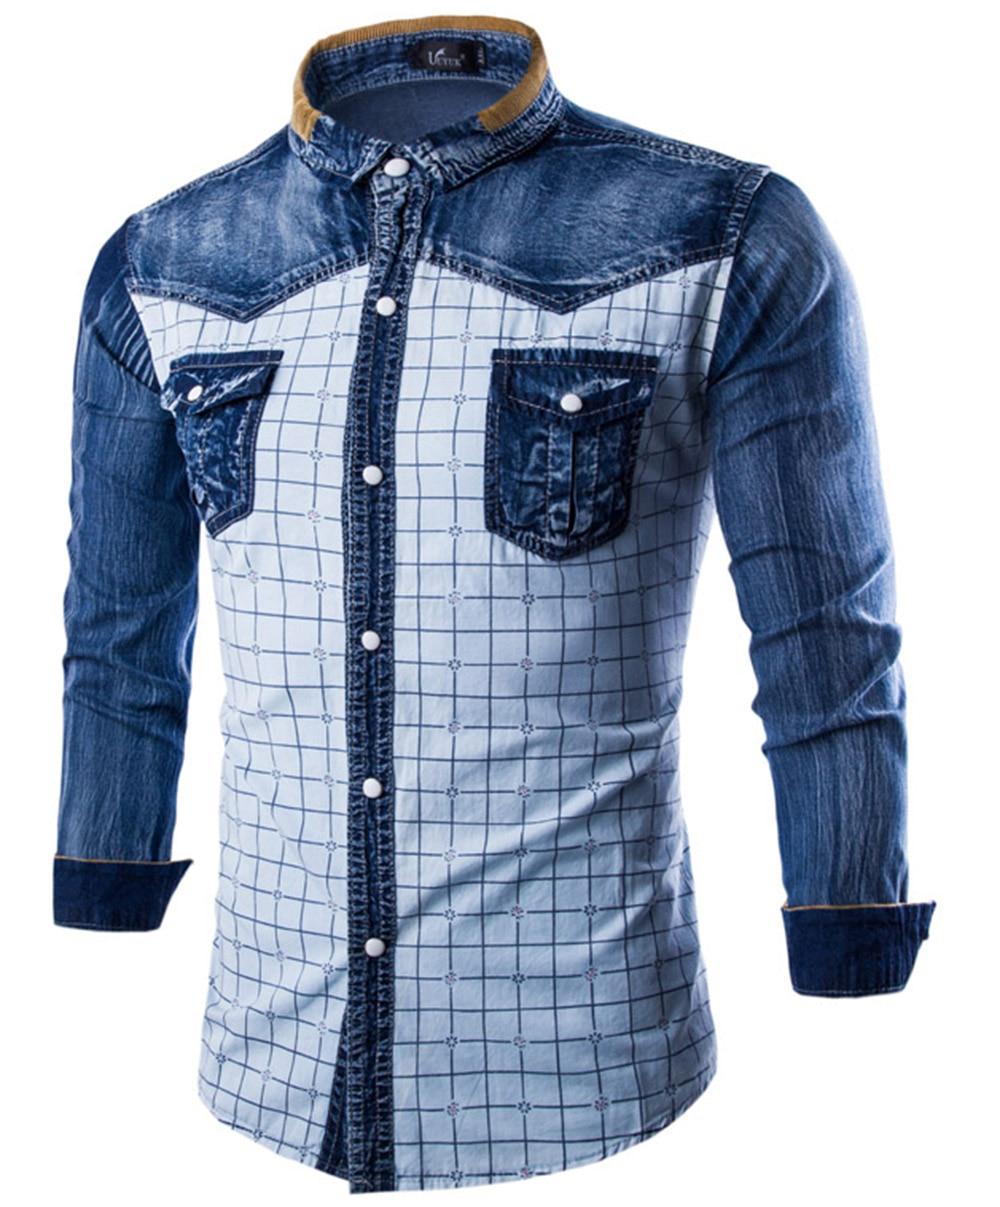 Aliexpress.com  Buy Men Jeans Shirts Long Sleeve Denim ...